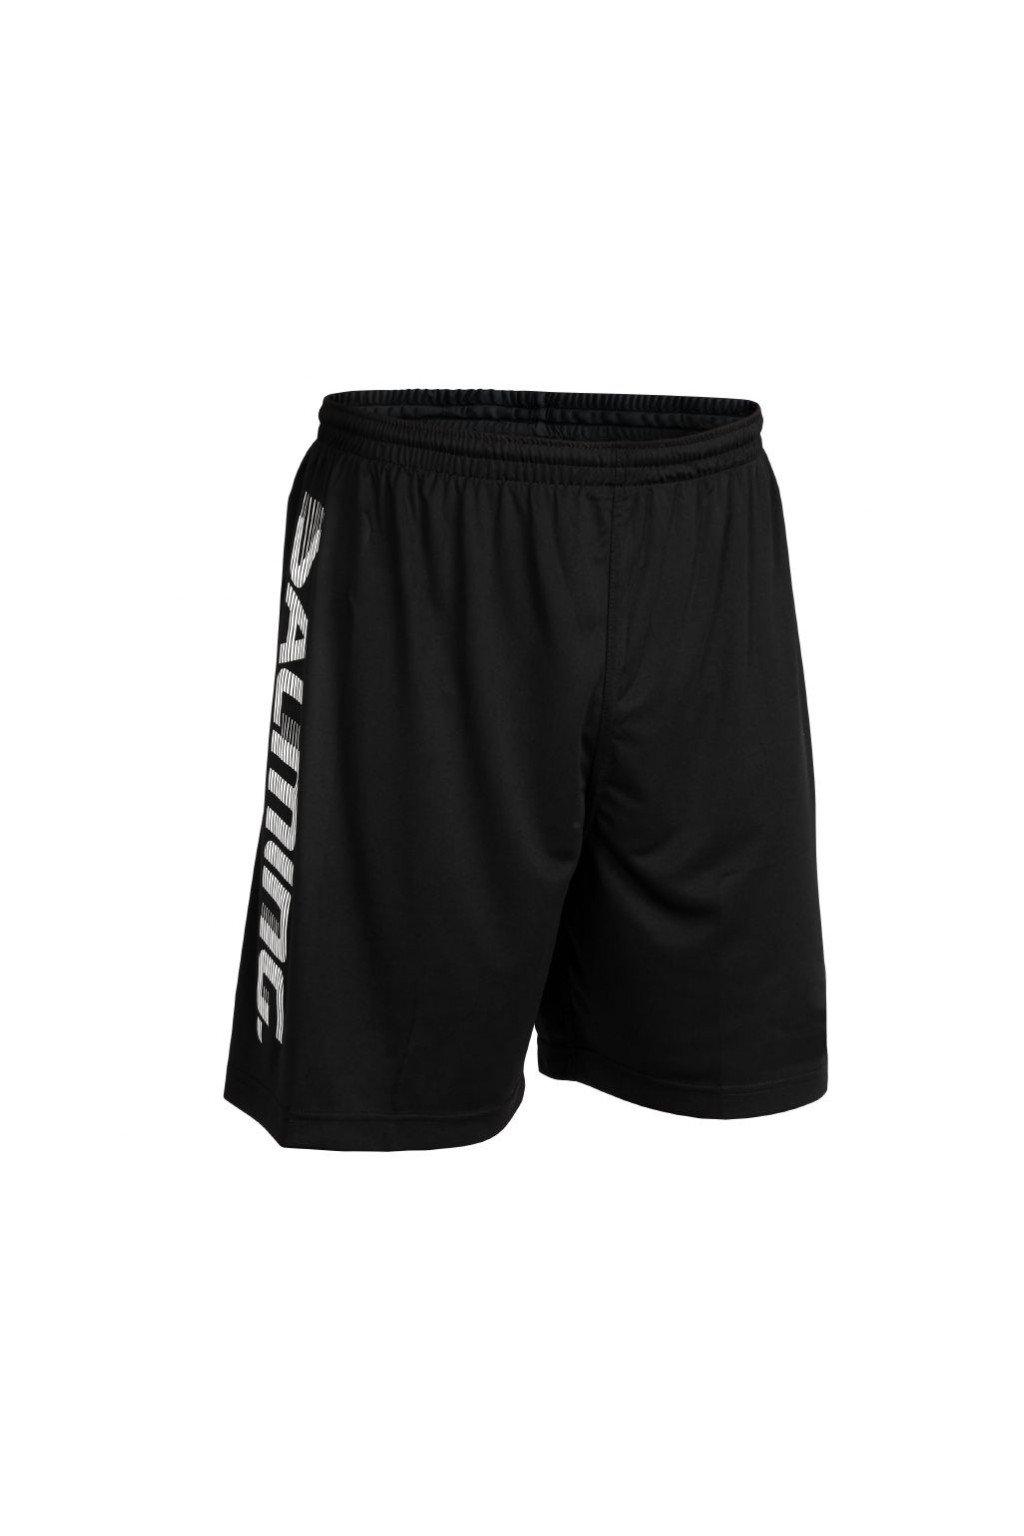 salming training shorts 20 jr black 164